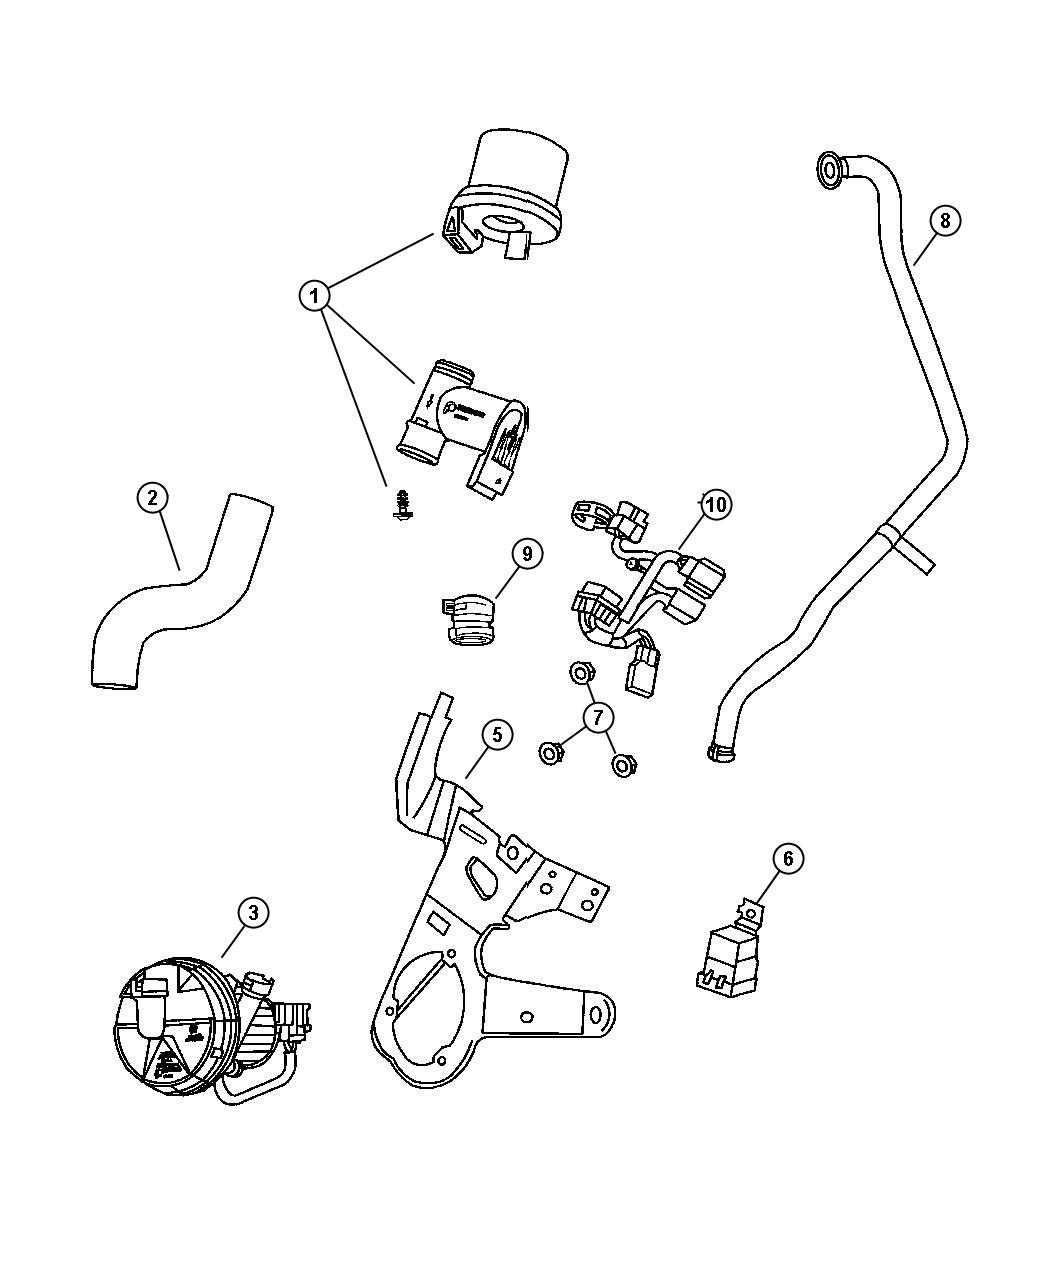 I on 2000 Dodge Stratus Cooling System Diagram